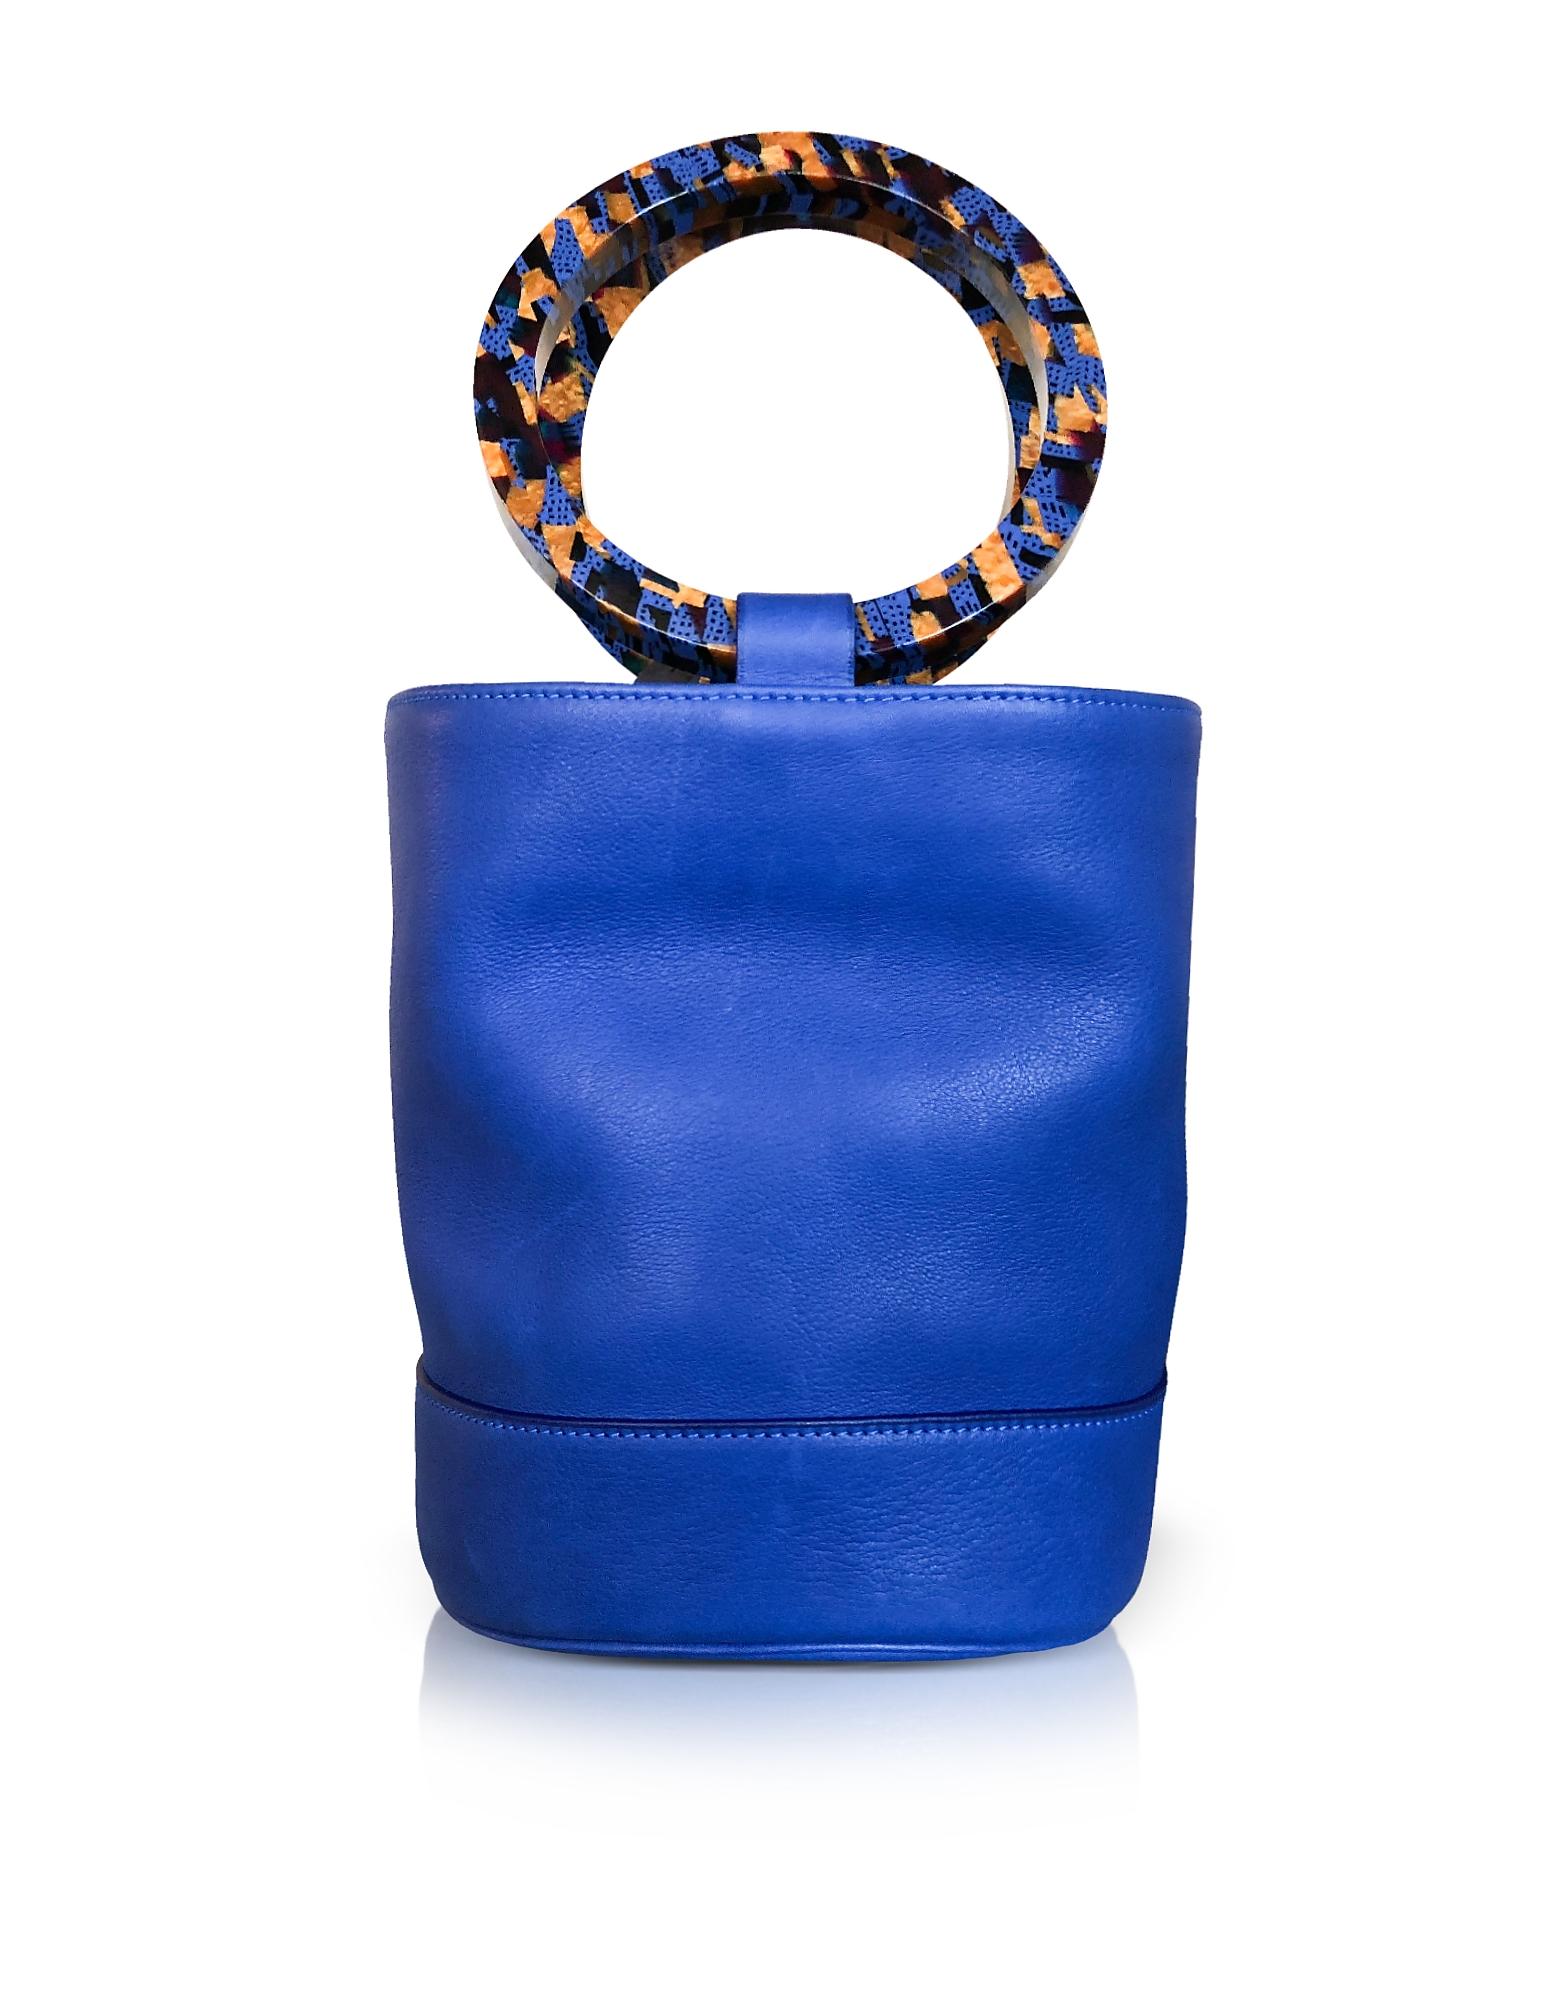 Image of Simon Miller Designer Handbags, Cobalt Blue Leather Bonsai 20cm Bag